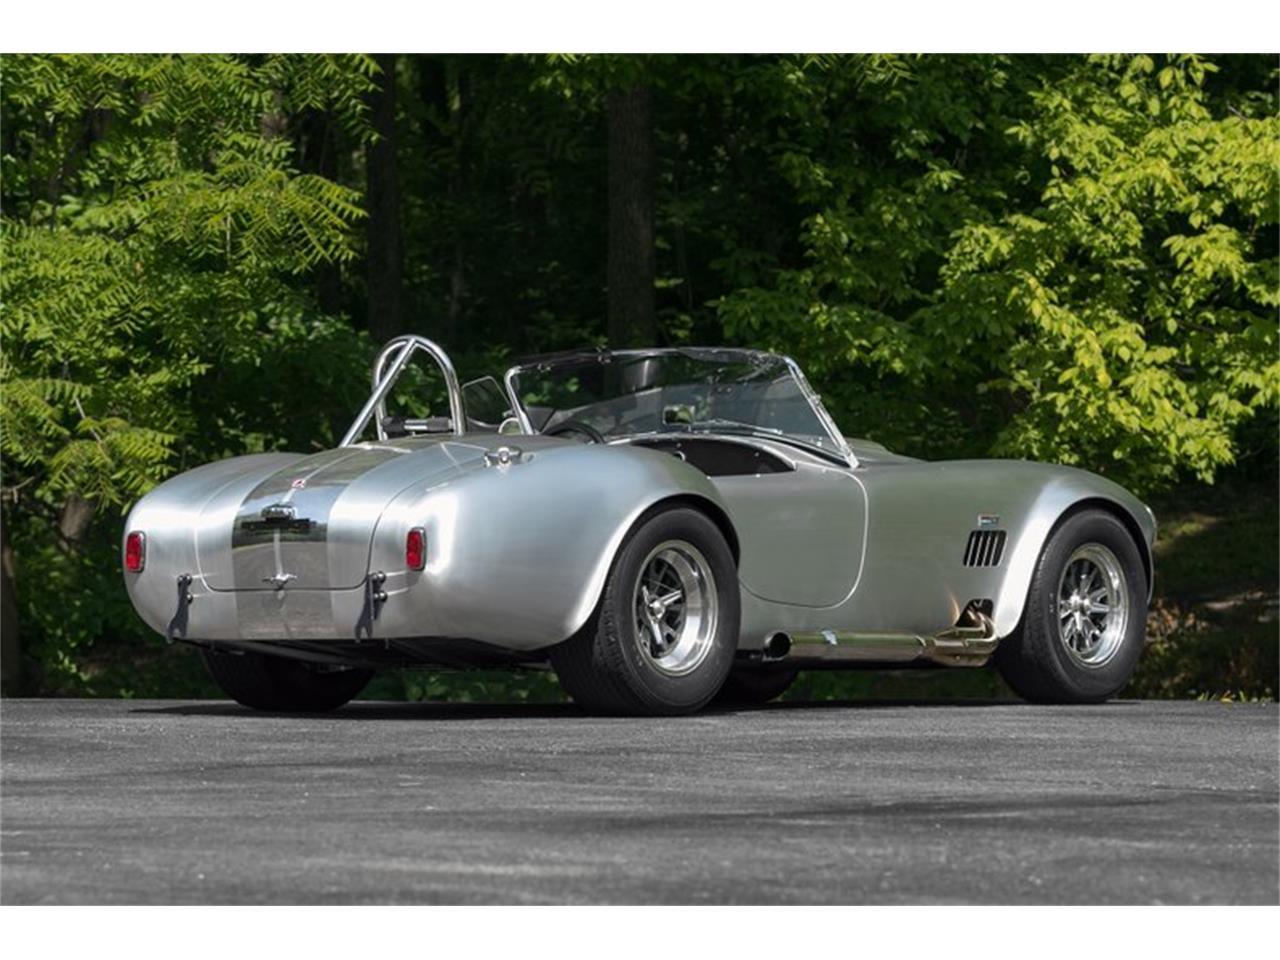 Large Picture of 1965 Kirkham Cobra located in Missouri - $179,995.00 - OAK6